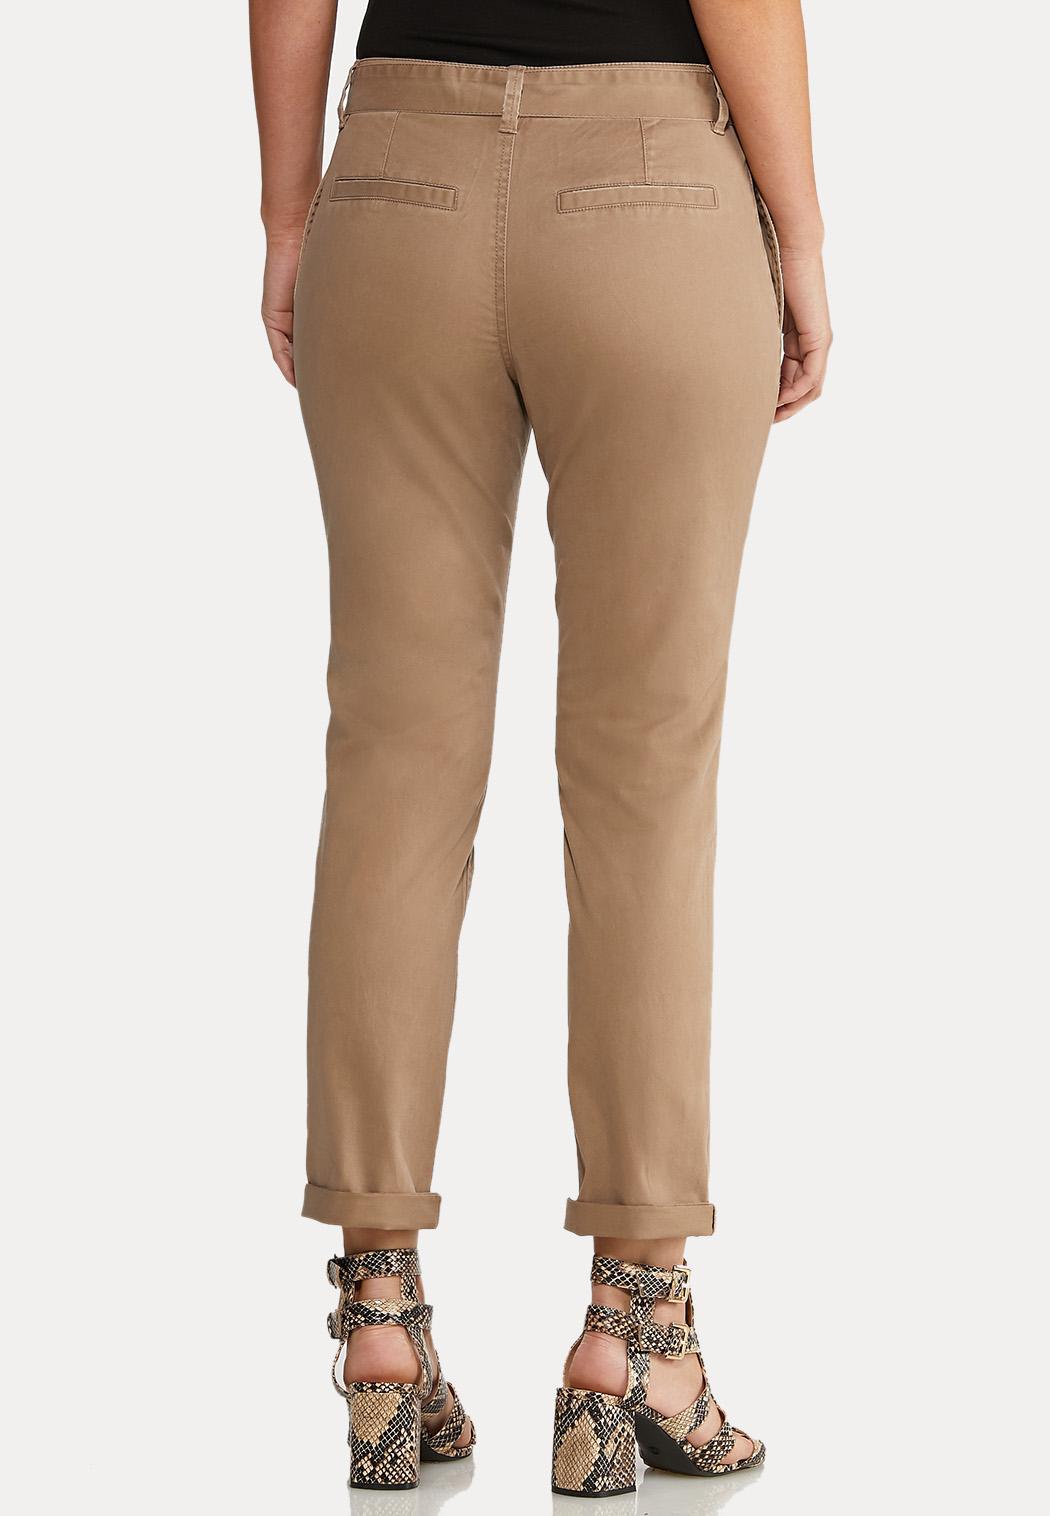 Tie Belt Chino Pant (Item #43960403)